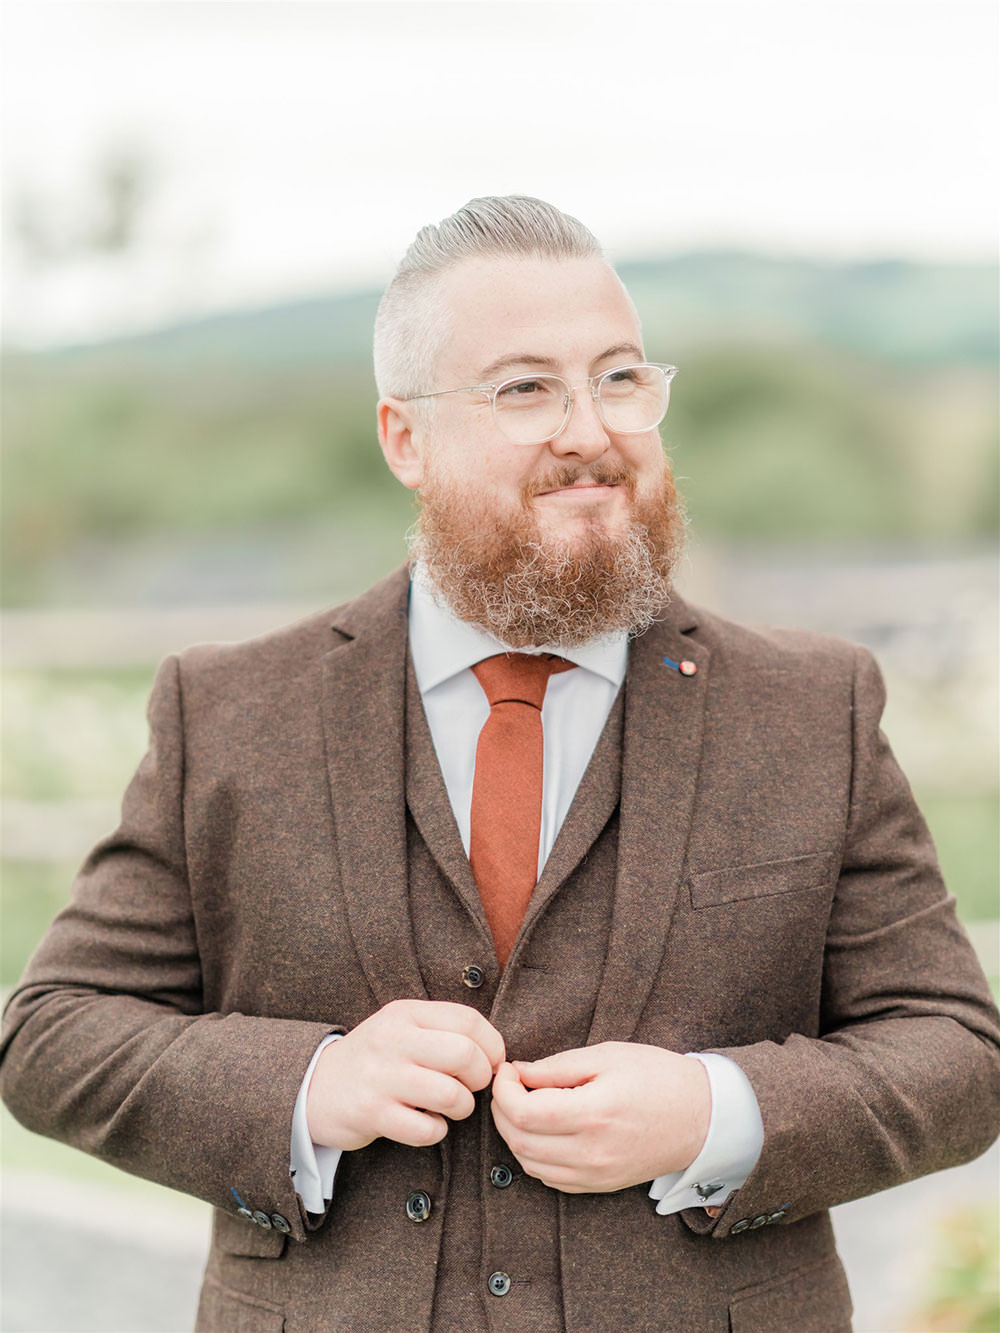 Slaters Tweed Three Piece Suit Waistcoat Groom Surprise Wedding Carn Patrick Photography